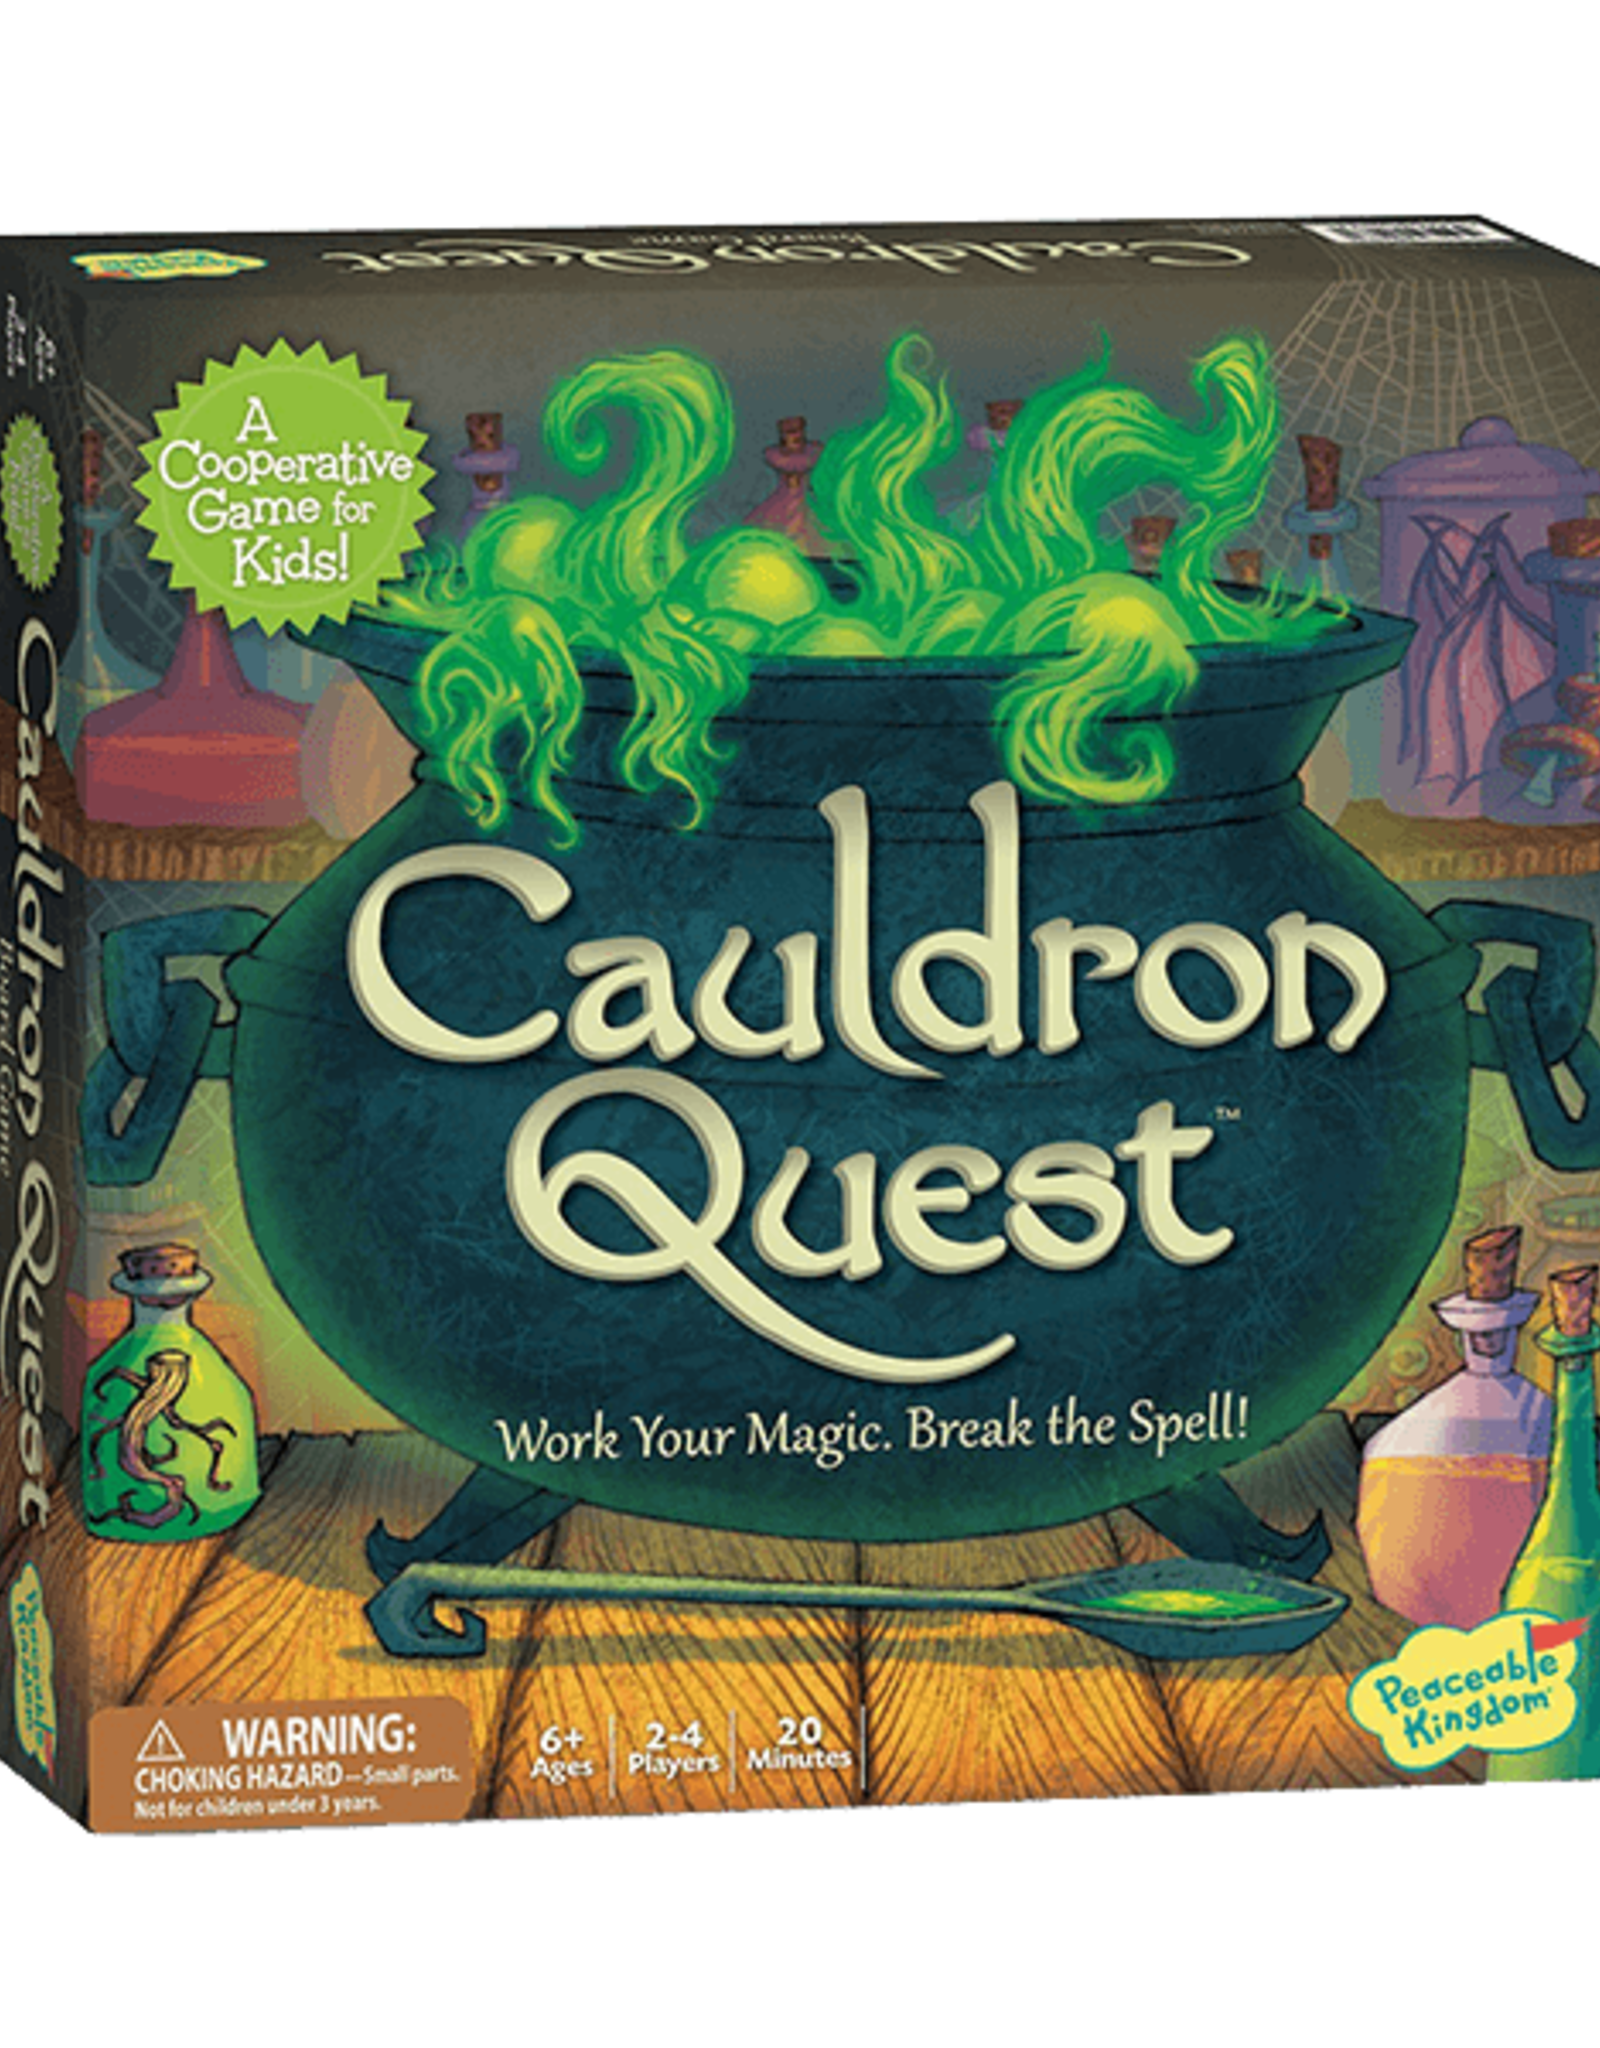 Peaceable Kingdom Peaceable Kingdom Cauldron Quest Board Game